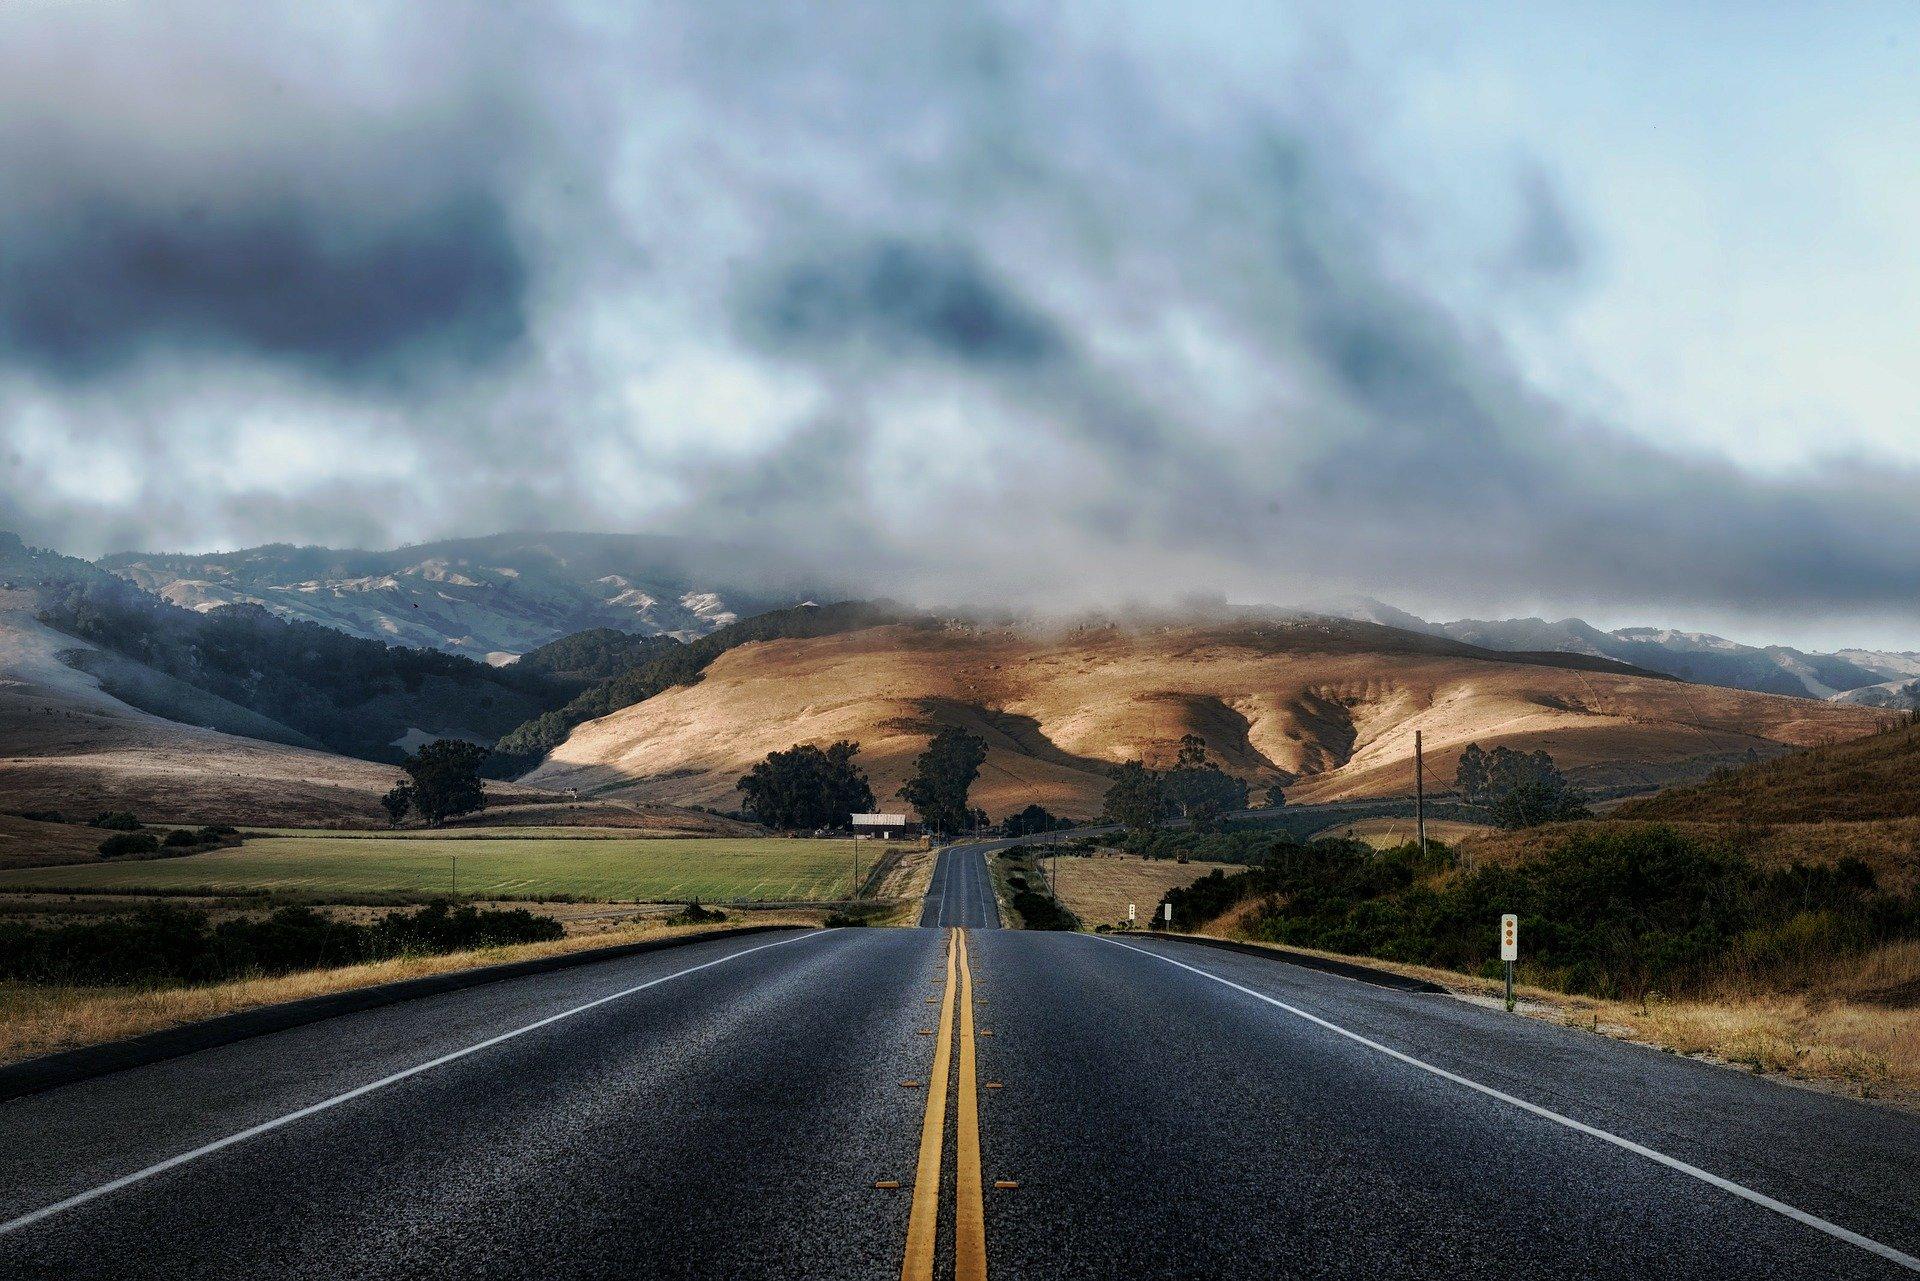 road-210913_1920